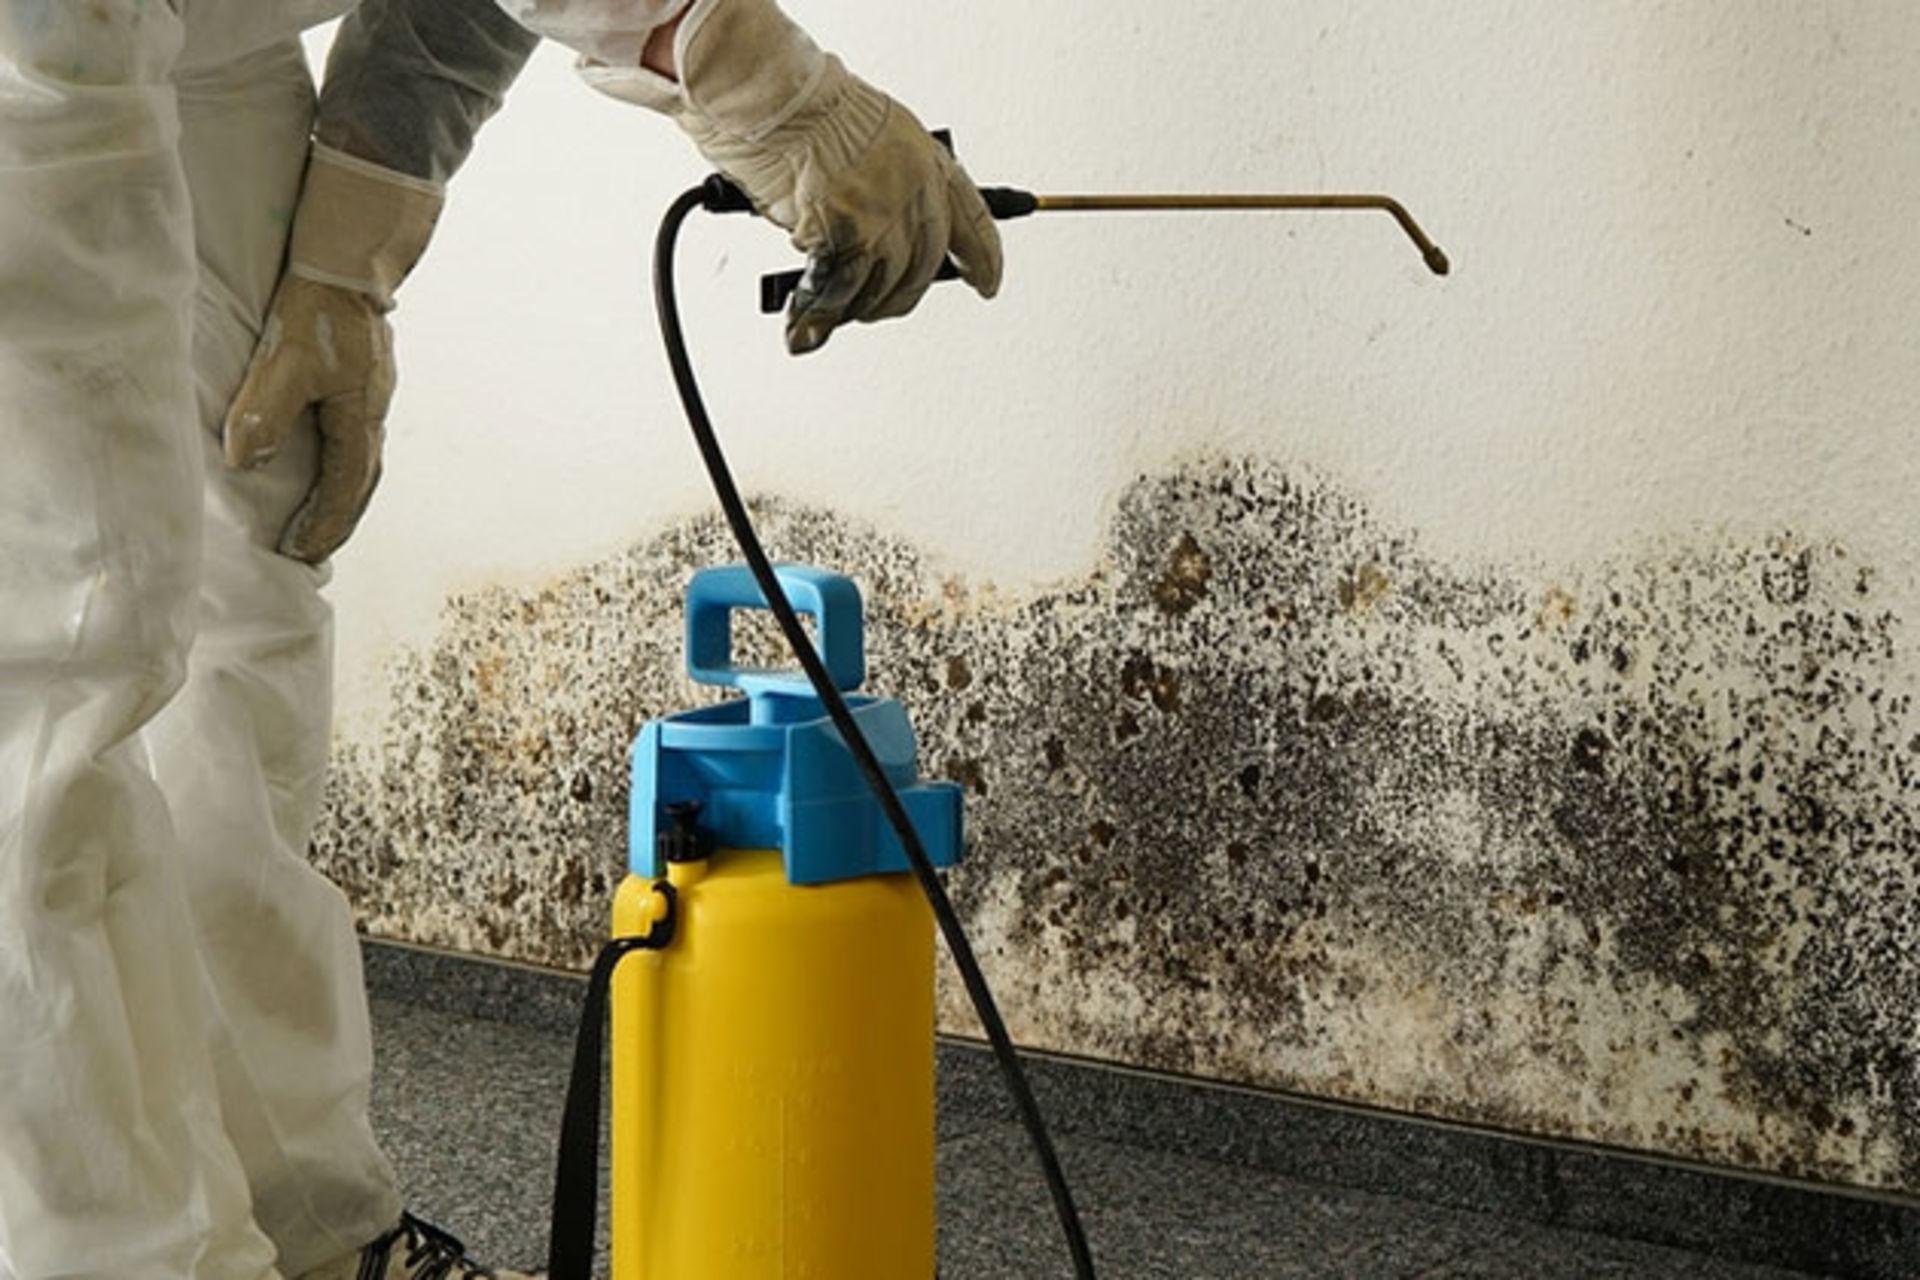 LSLBC addresses questions regarding mold remediation